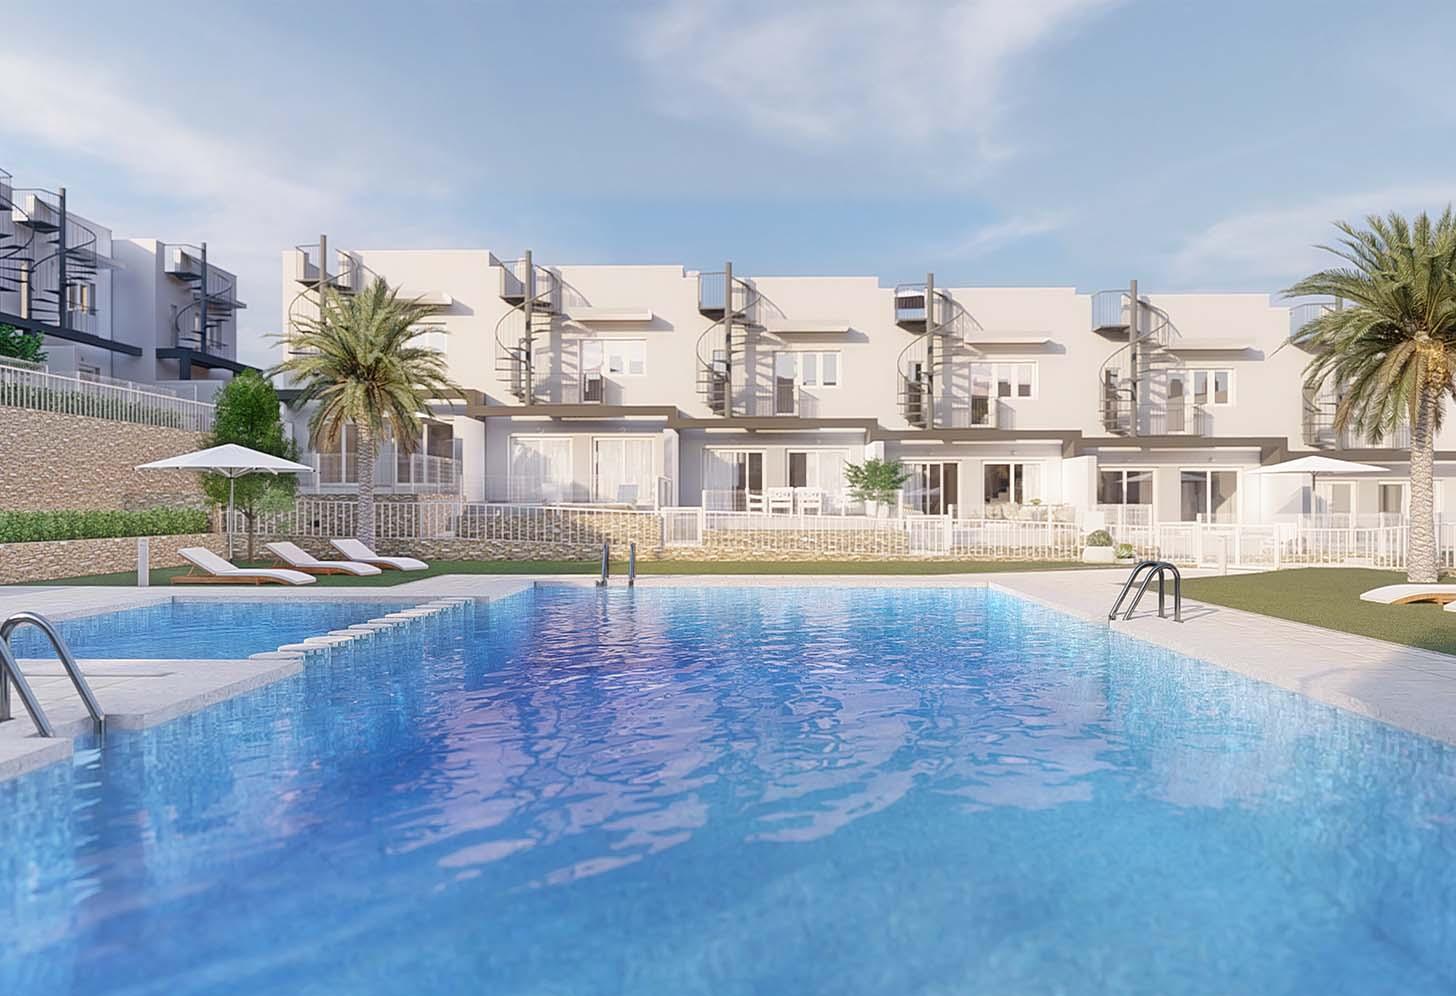 immobilier neuf espagne costa blanca on-j2 kiruna hills piscine